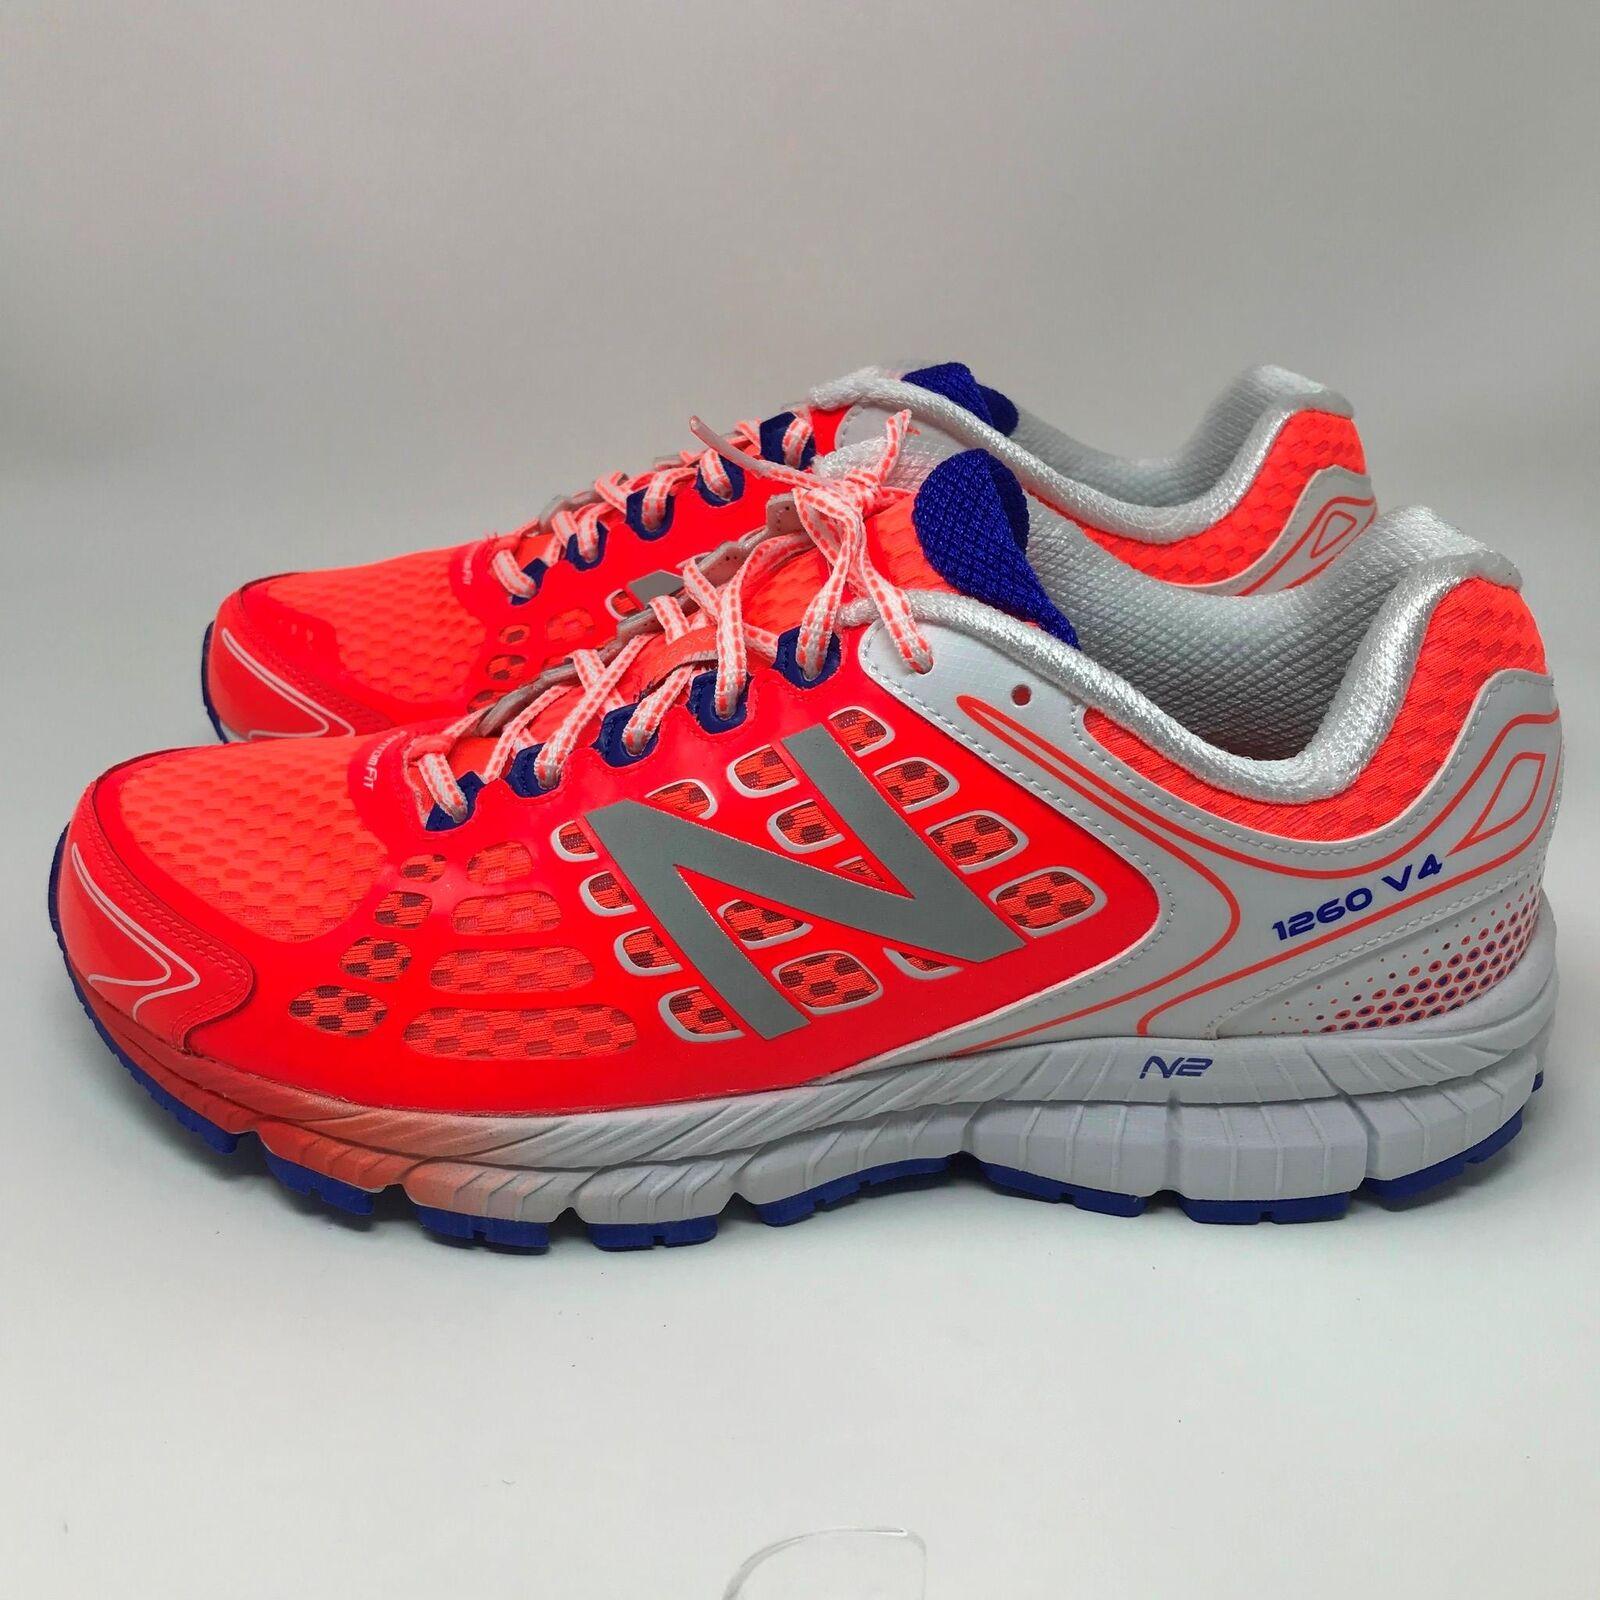 New Balance 1260v4 Neon Orange Running Training Shoes Women's Size: 12 (D)